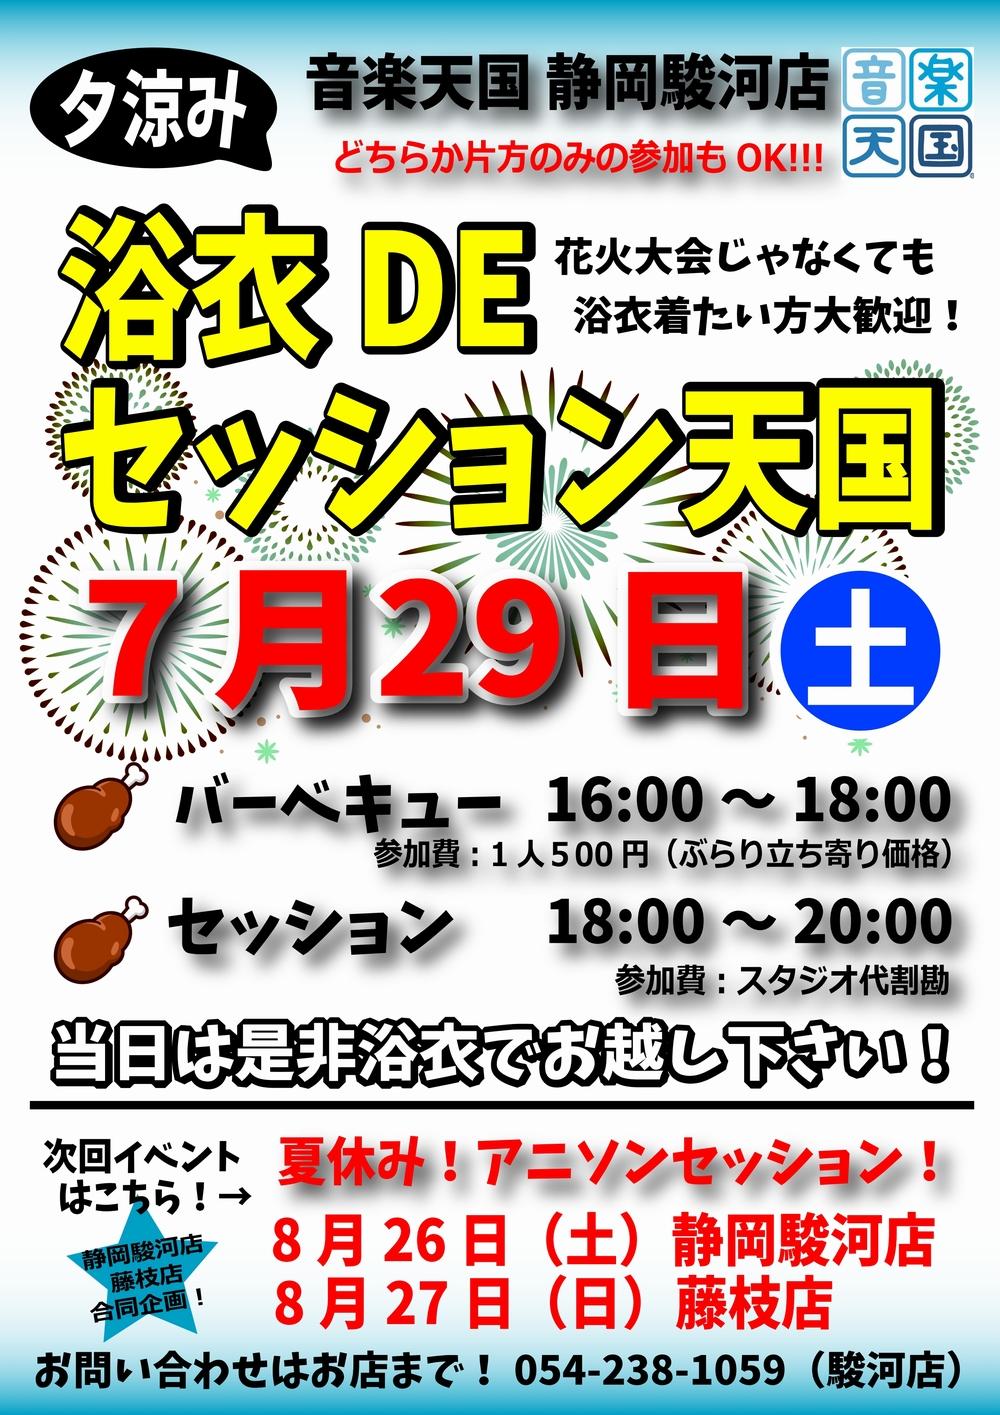 【浴衣DEセッション天国&BBQ】音楽天国・静岡駿河店7月29日(土)